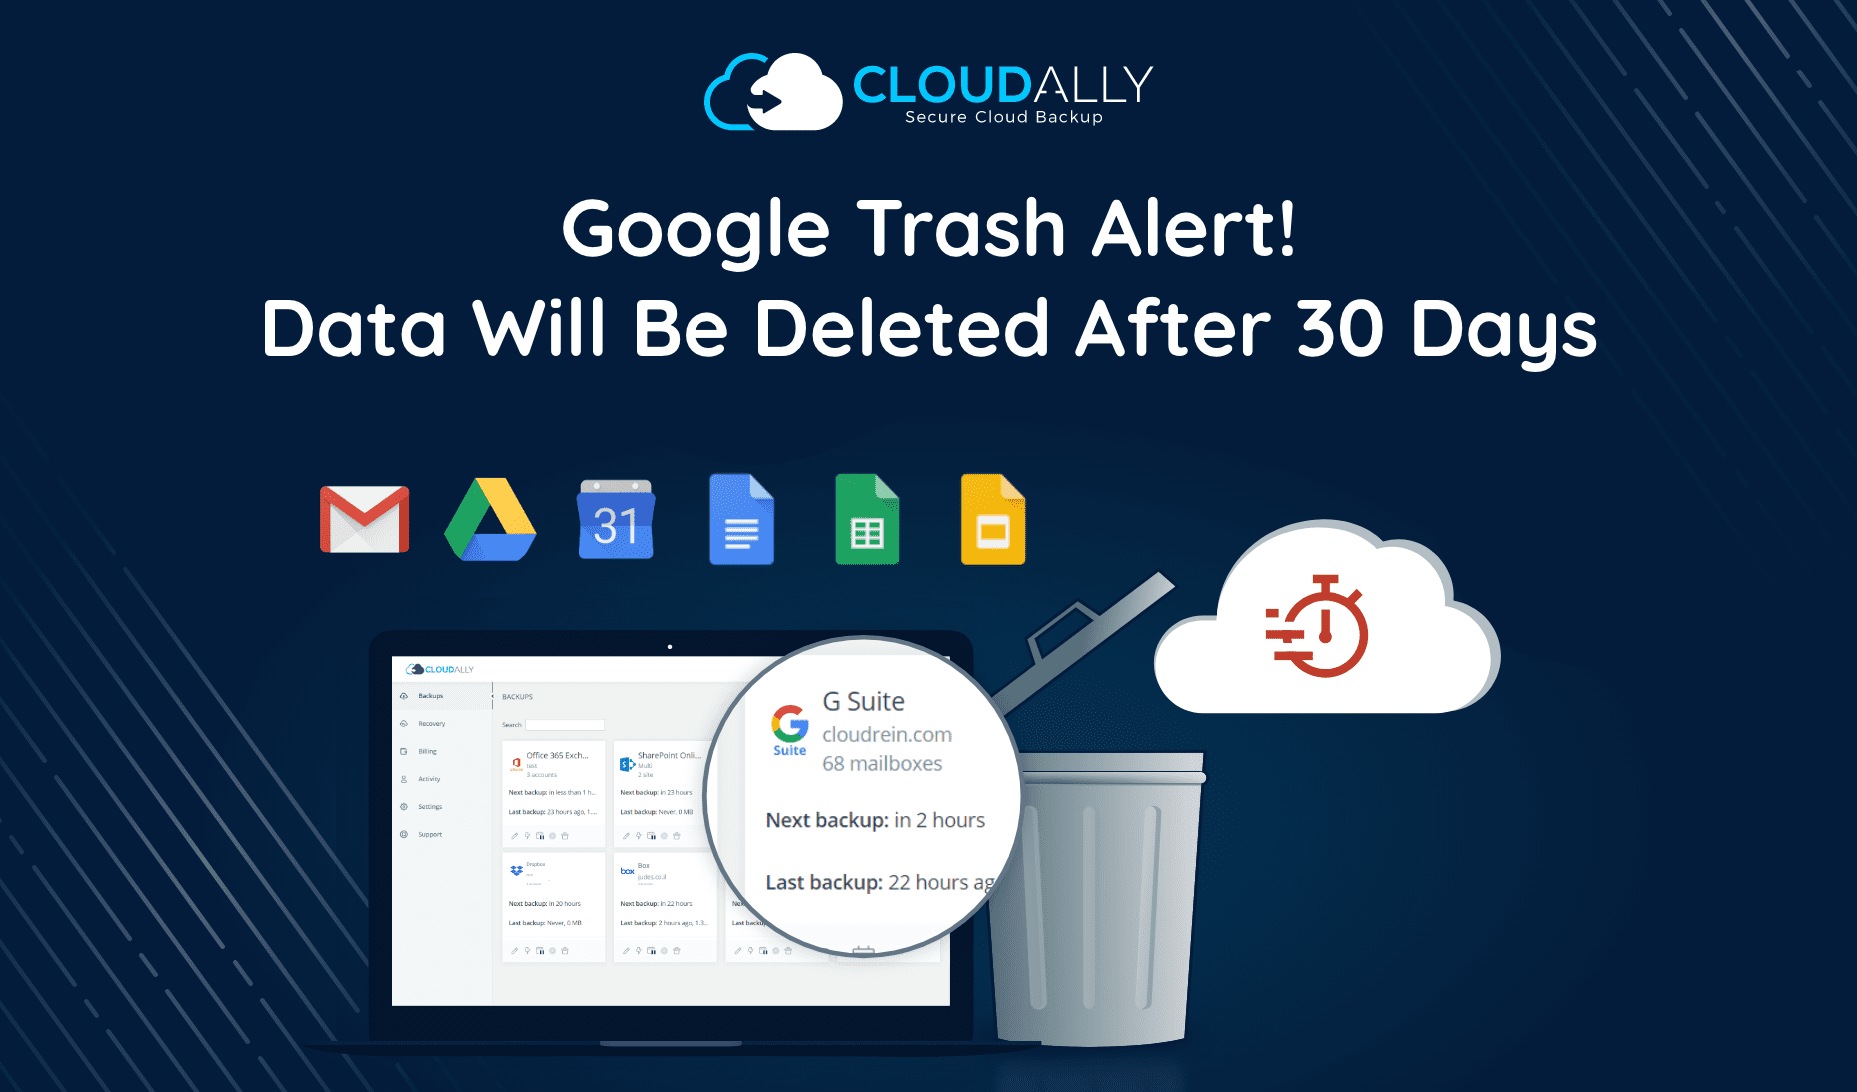 Google Trash Alert